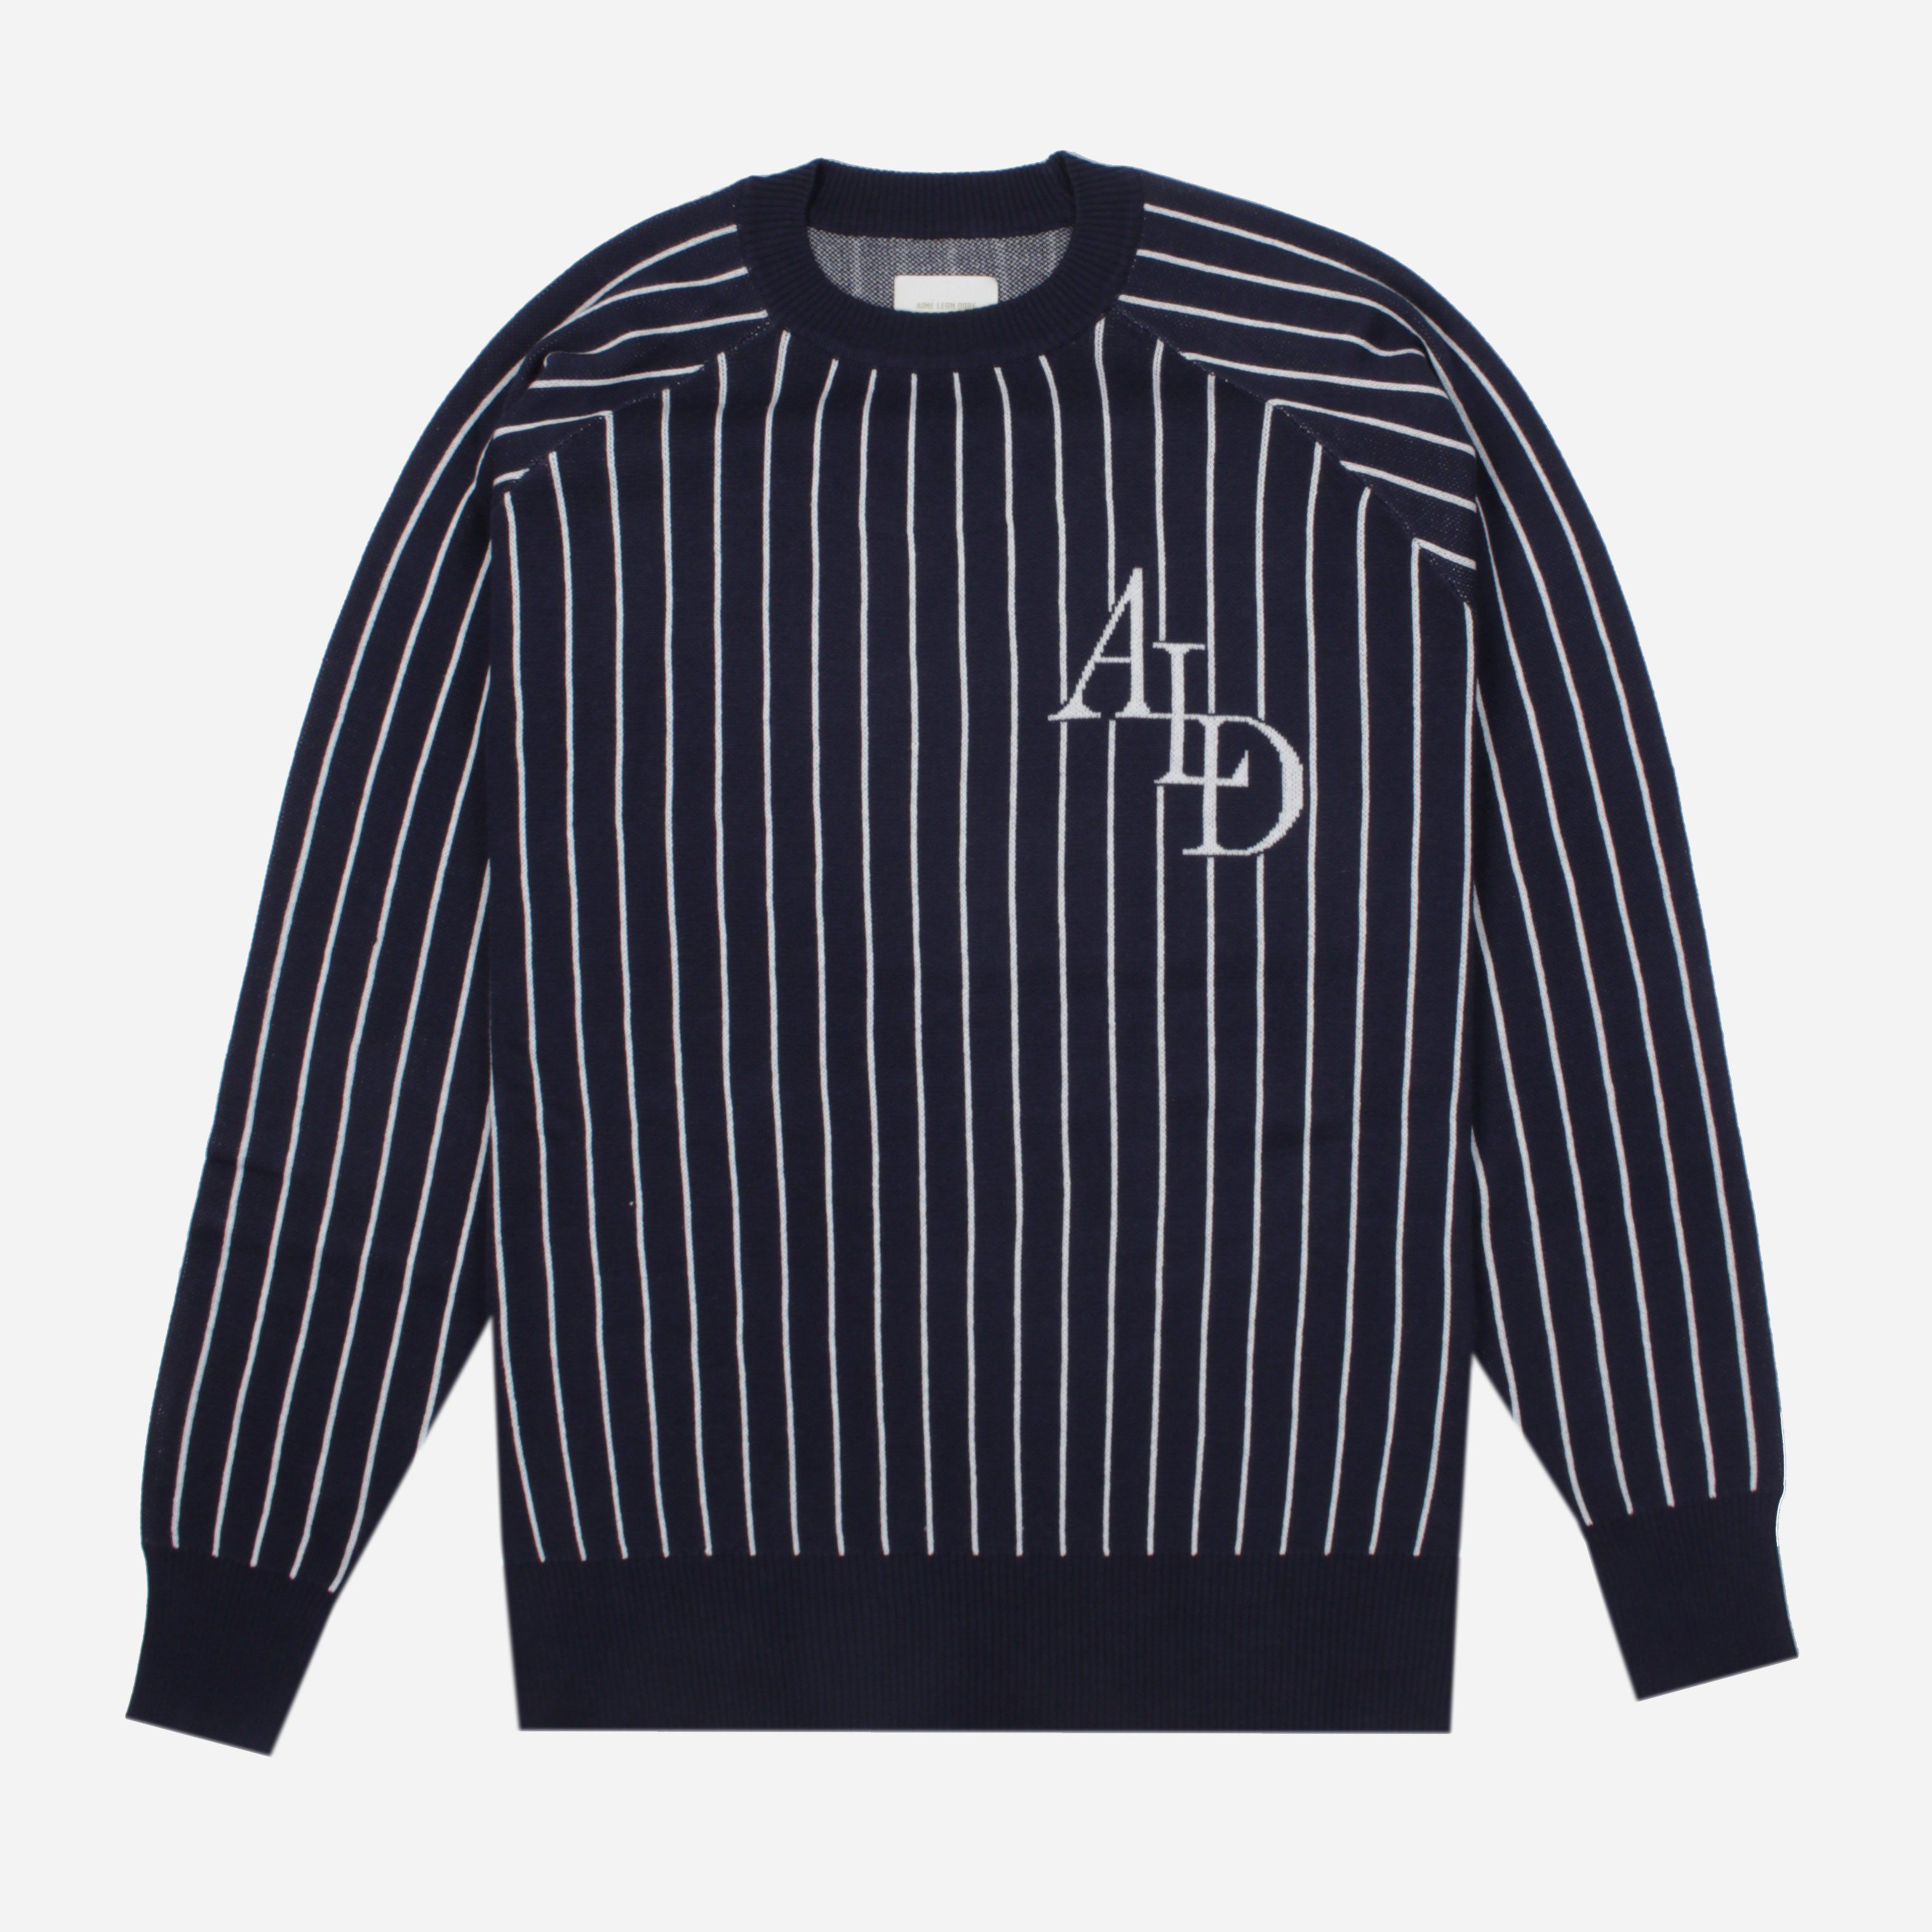 Aime Leon Dore Stadium Knit Sweatshirt